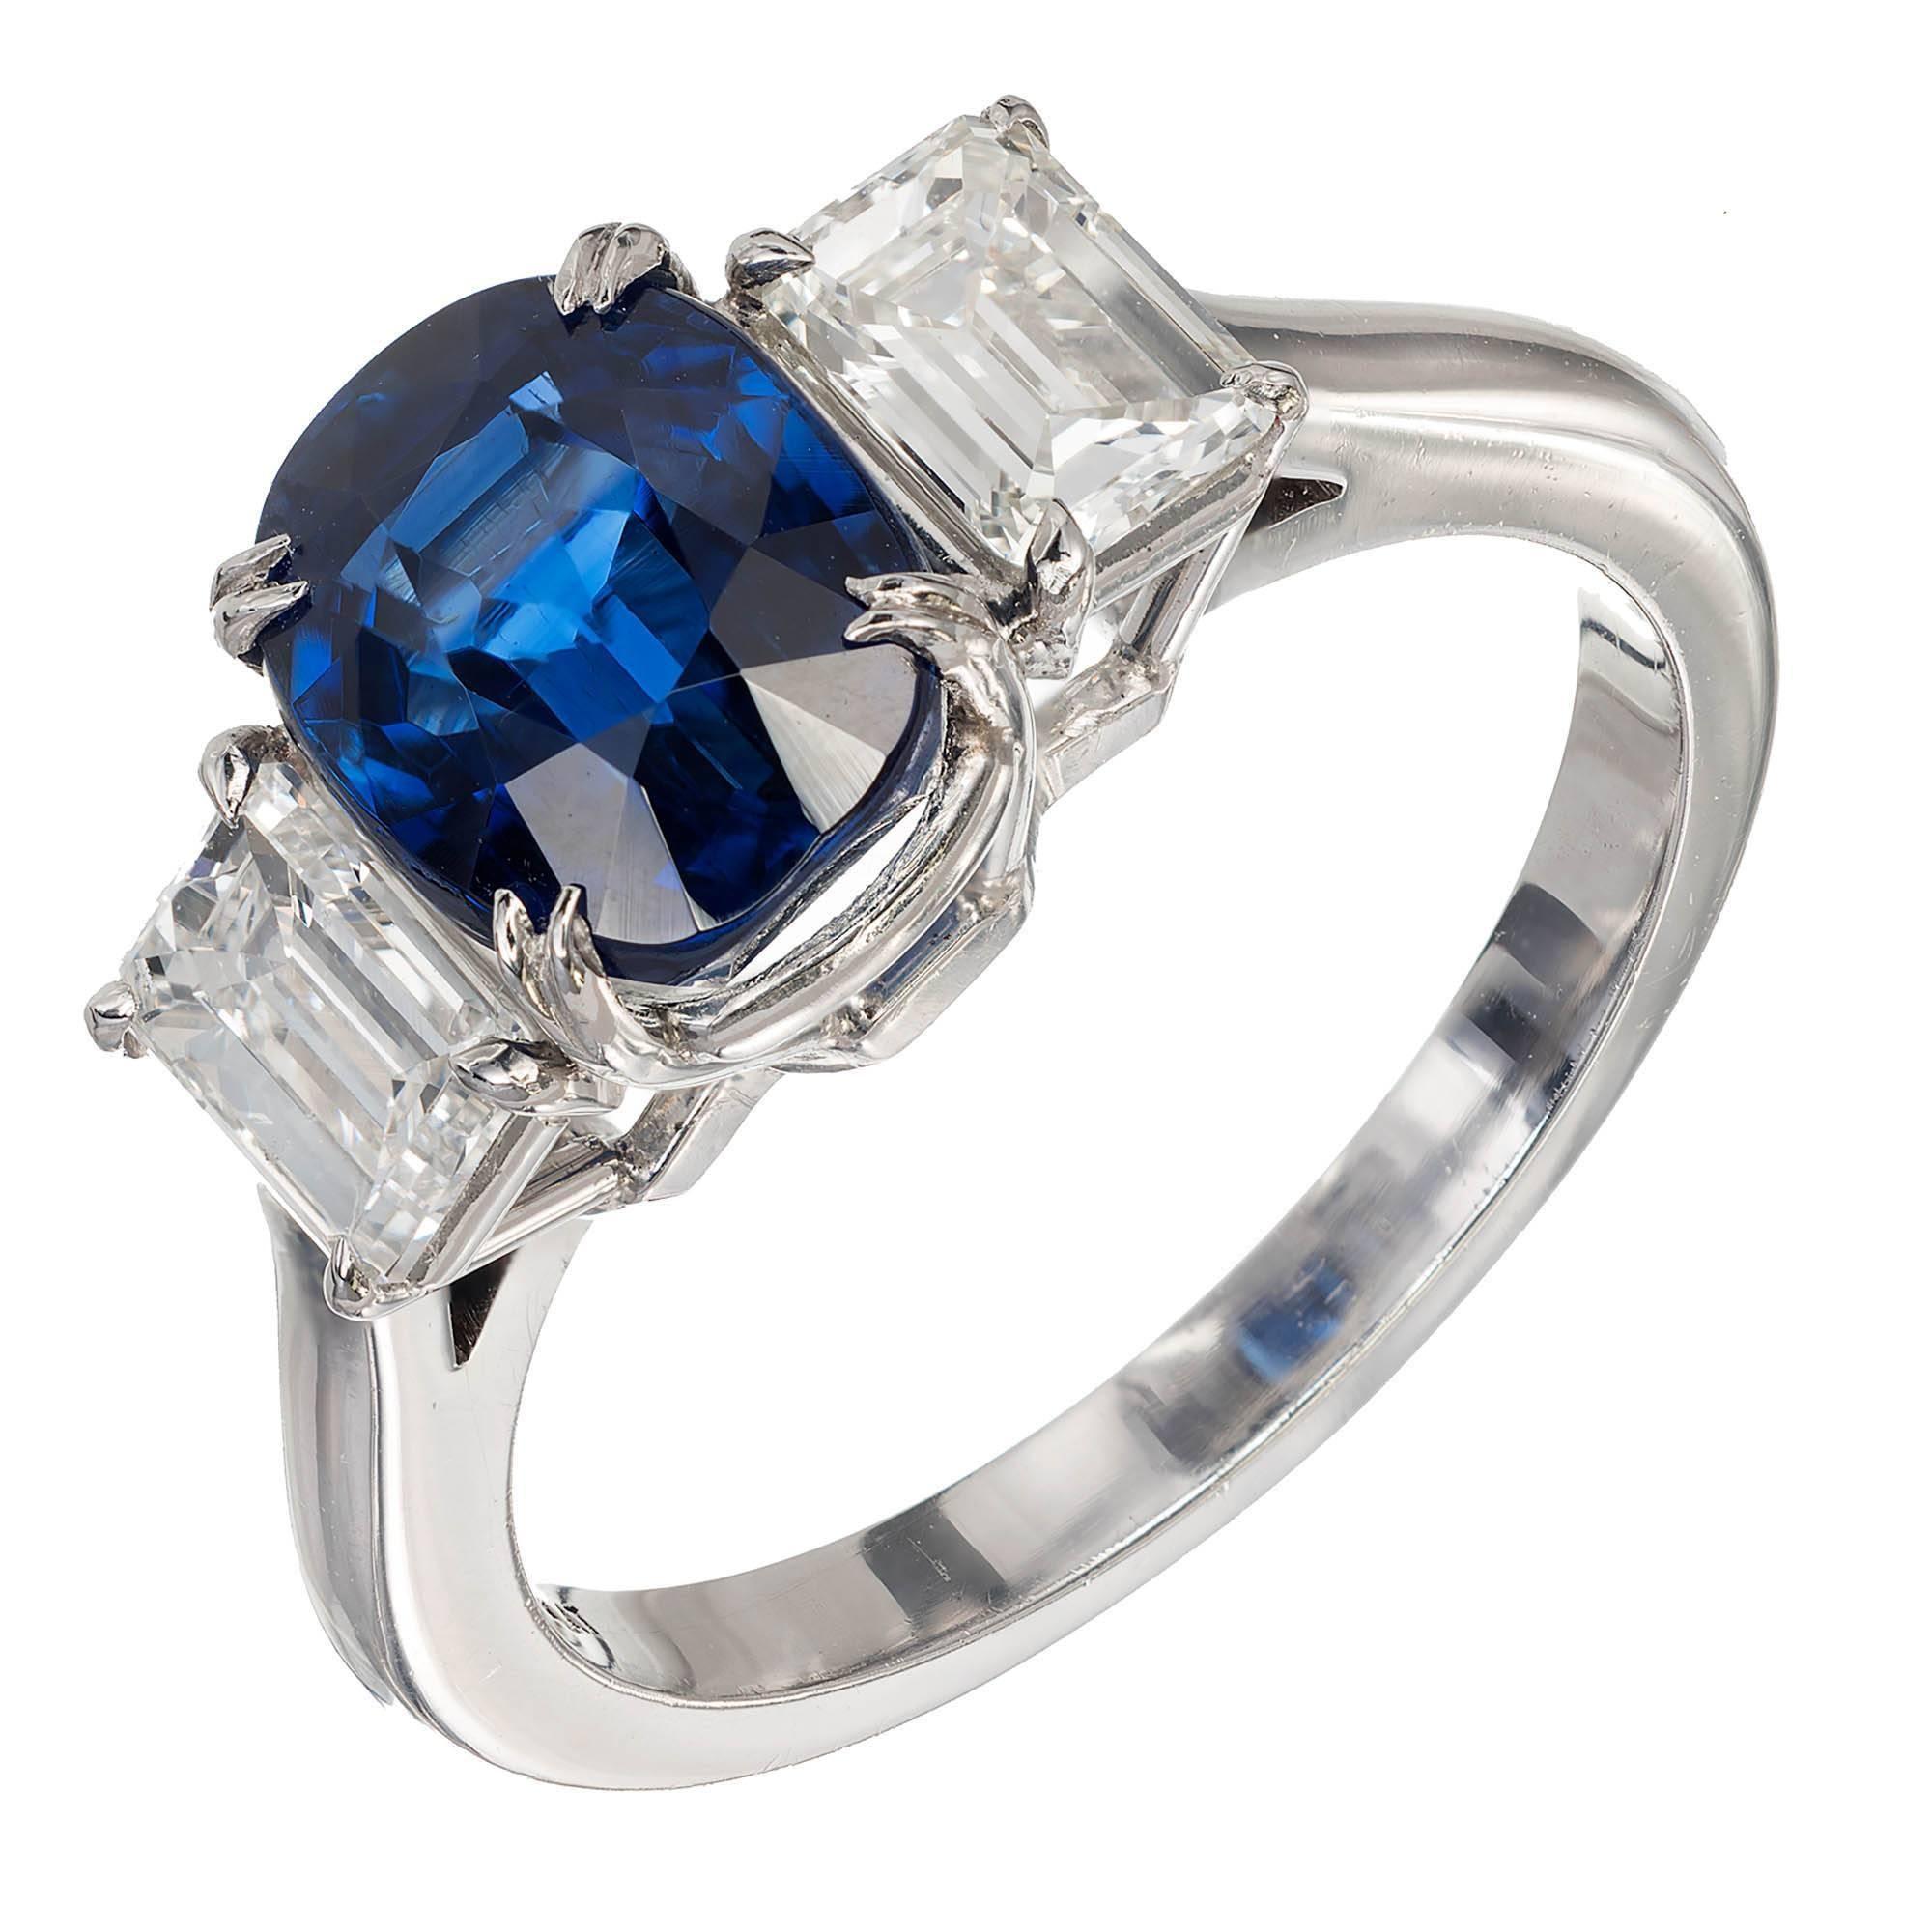 Peter Suchy 3.11 Carat Cushion Cut Sapphire Diamond Platinum Engagement Ring